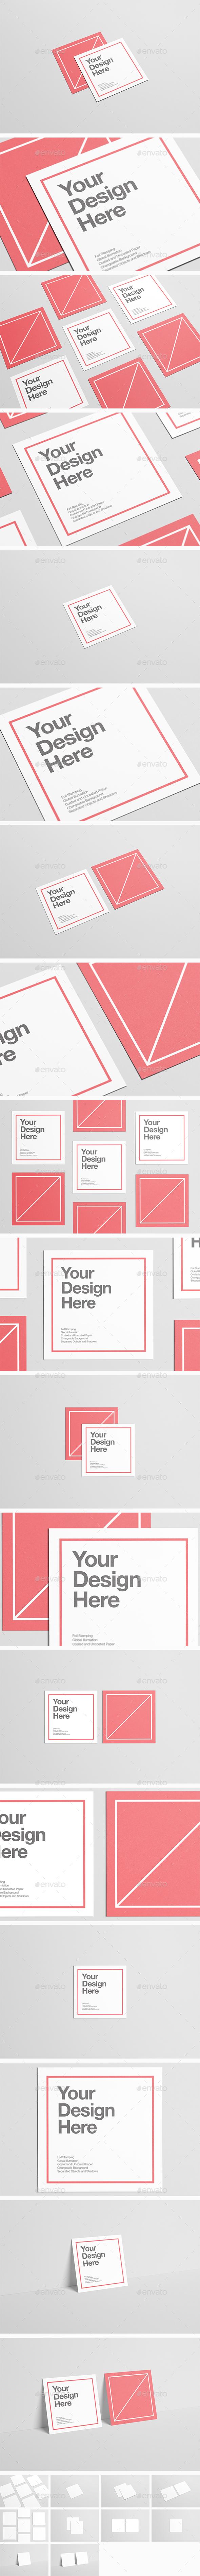 Square Flyer Mock-Up - Flyers Print